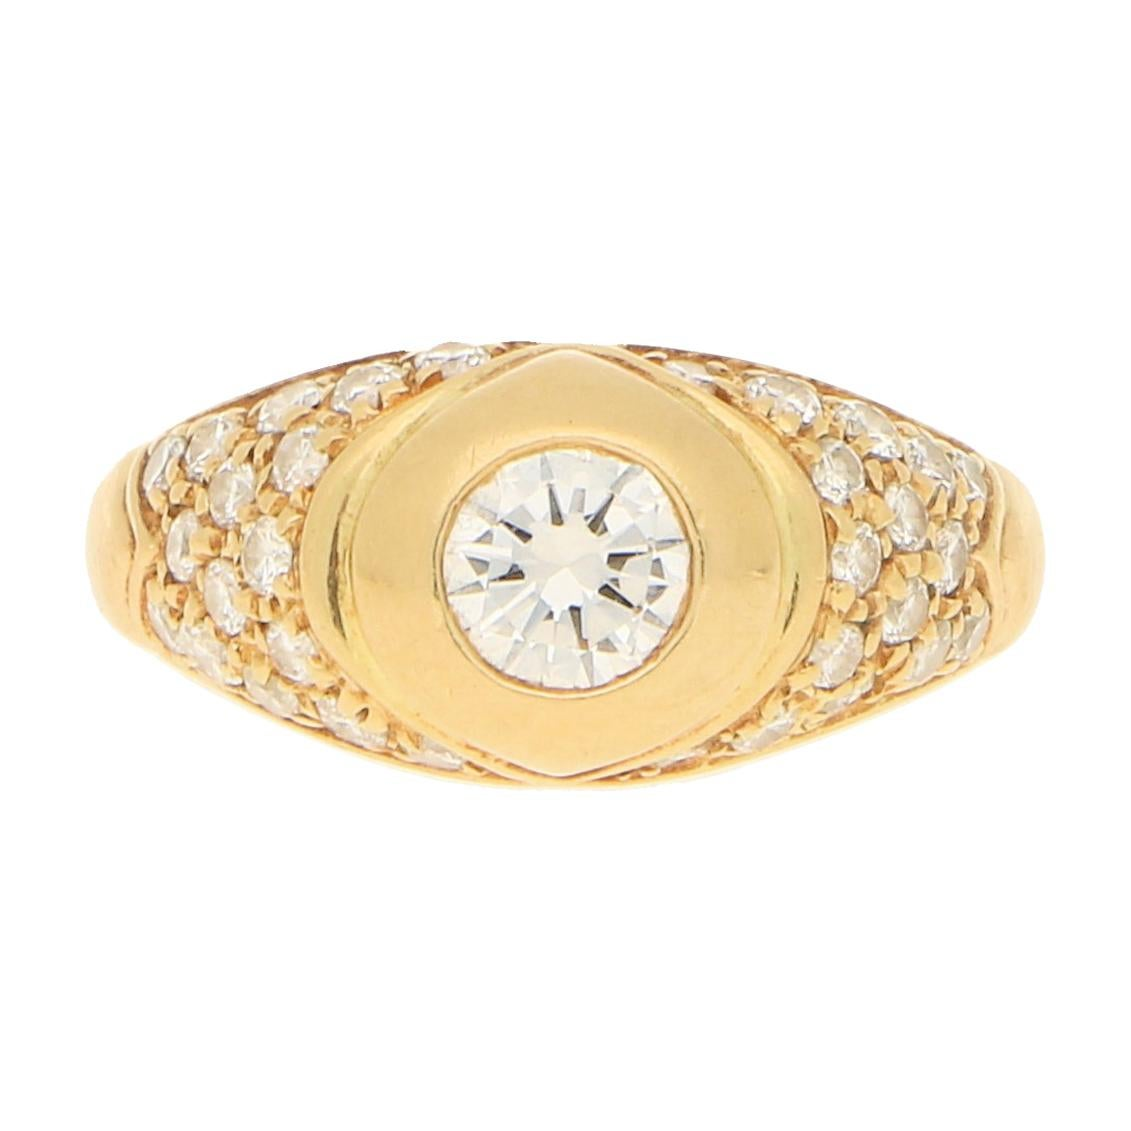 Bvlgari Diamond Engagement/Cocktail Ring in 18k Yellow Gold